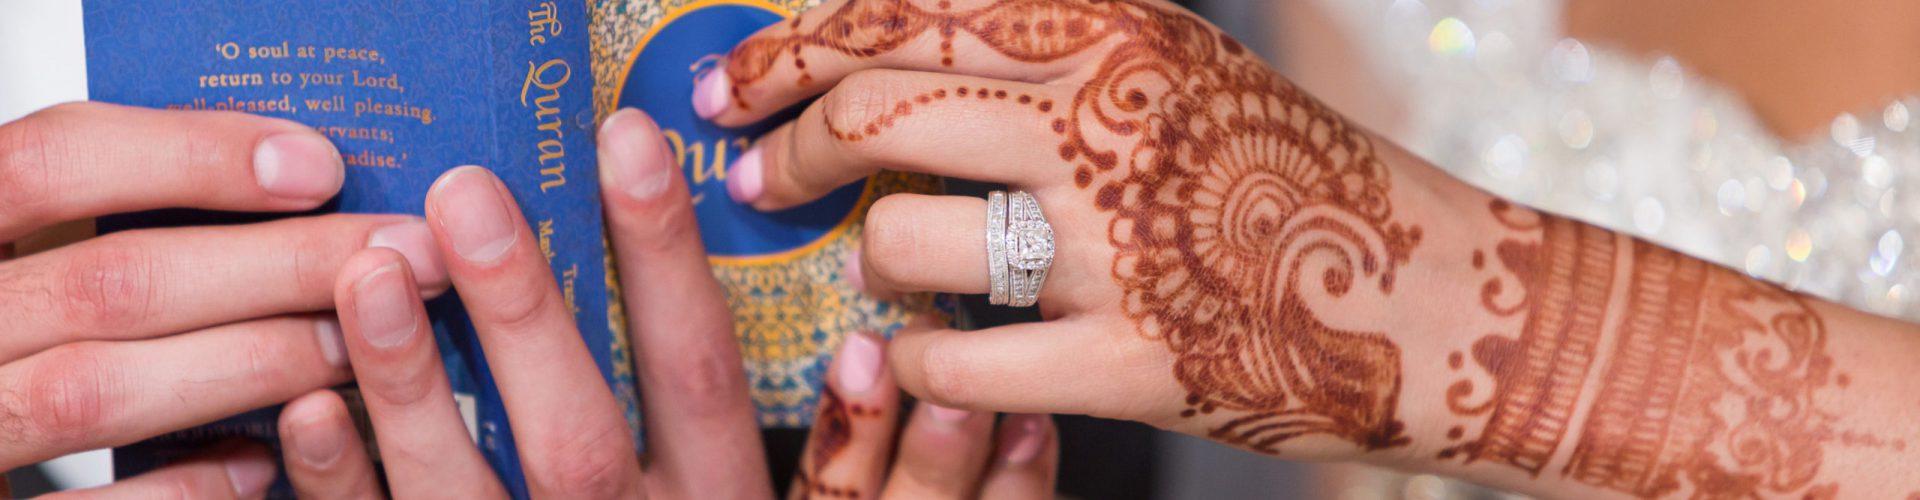 Indian Wedding Photographer | Oakland | } Motion 8 Films | Indian Sikh Hindu Wedding Photography Cinematography